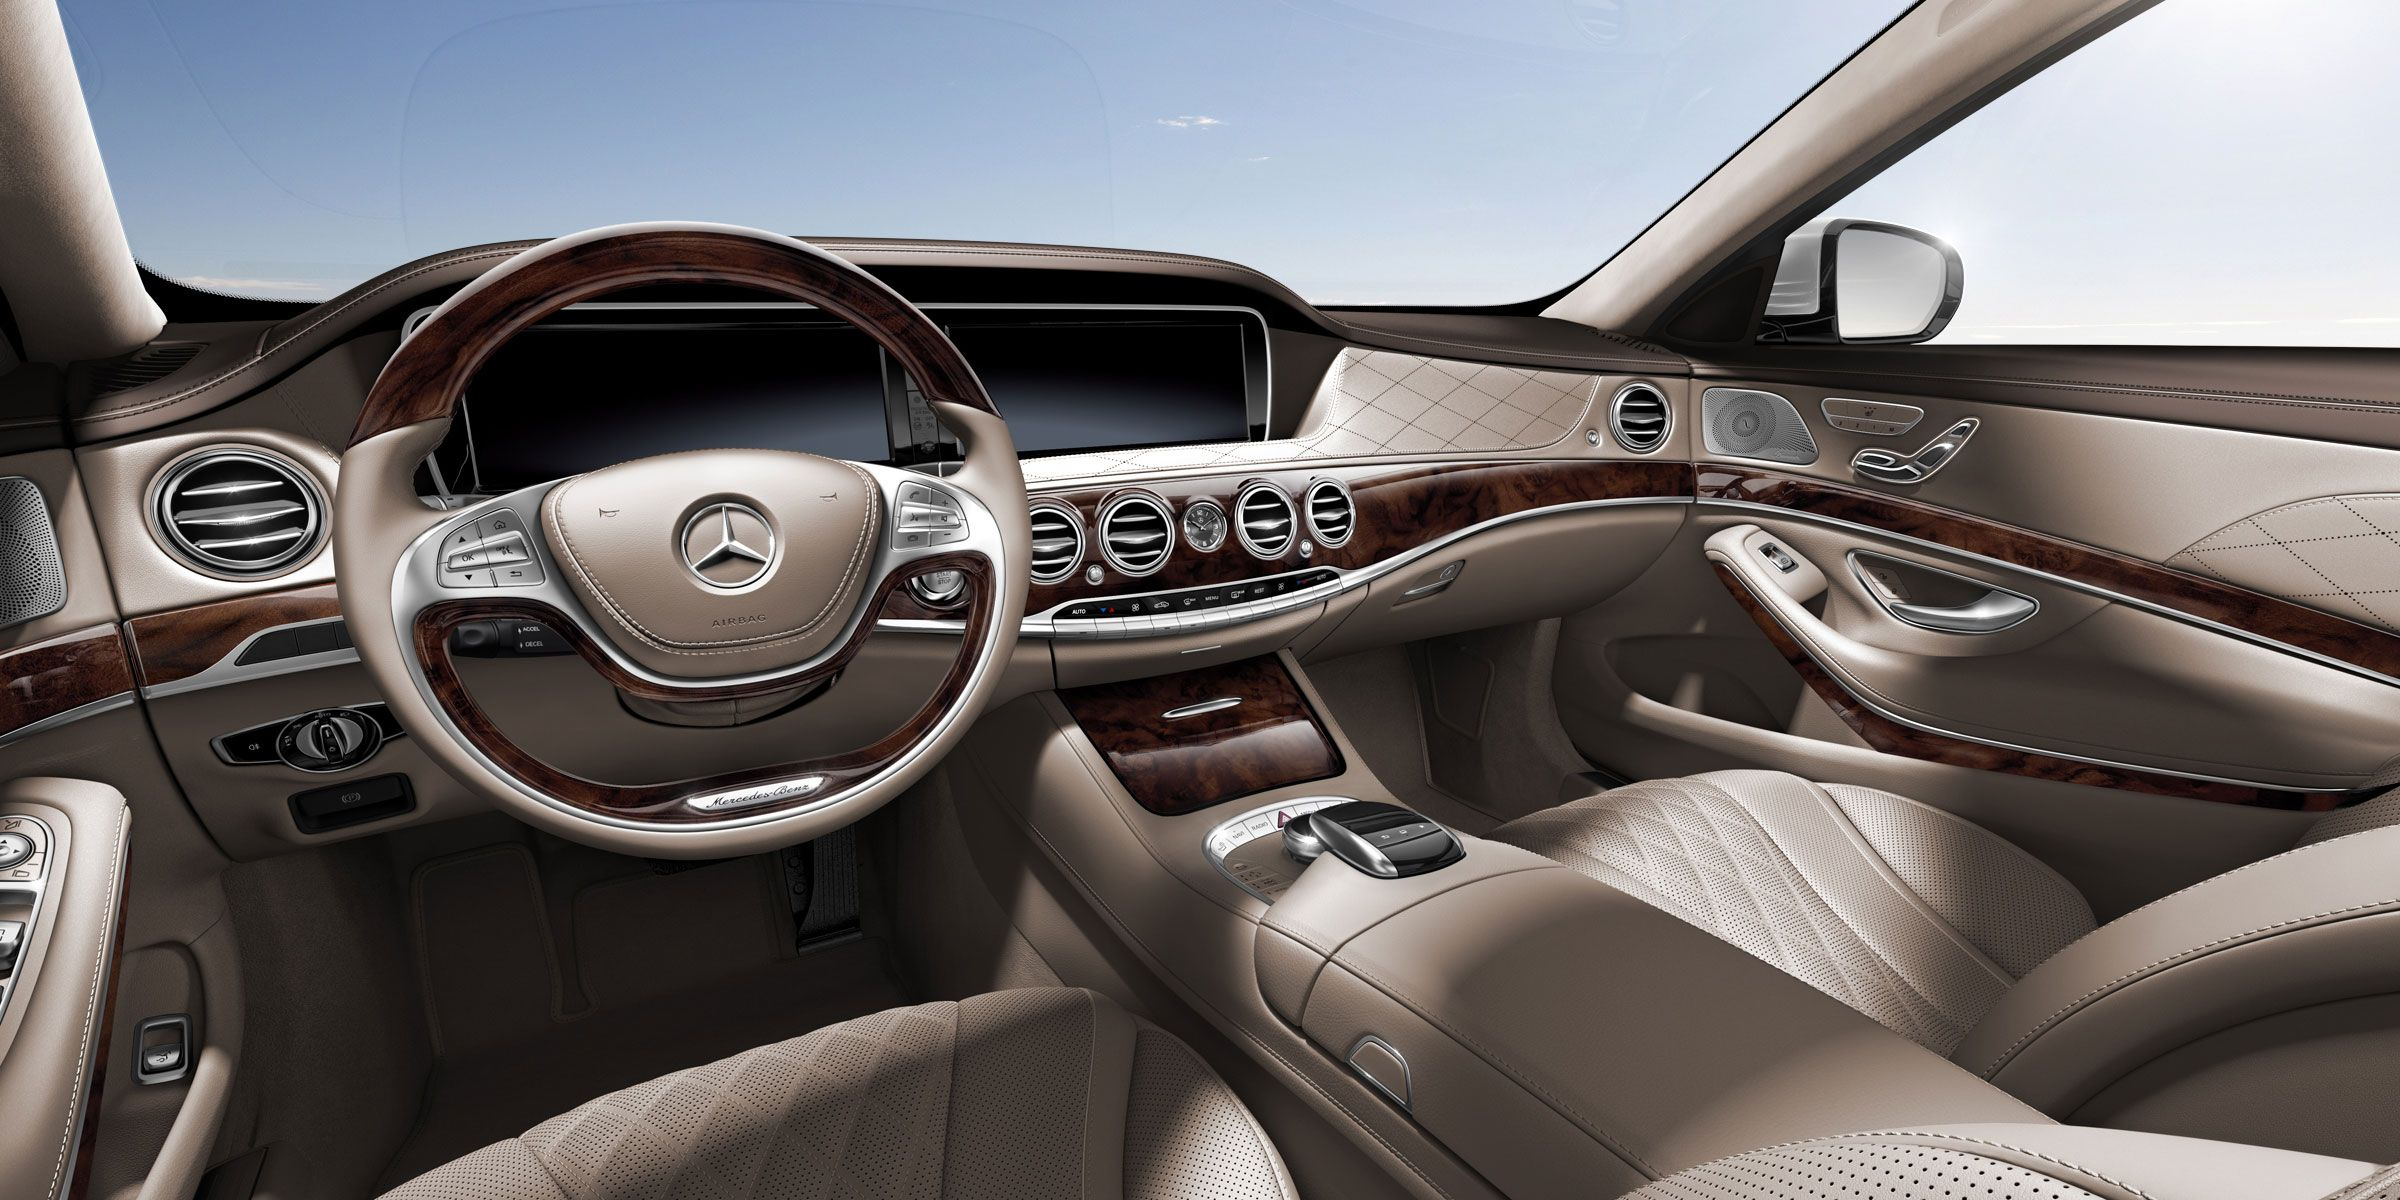 My Mercedes Benz S550 2015 Diamond Silver Luxury Sedan Custom